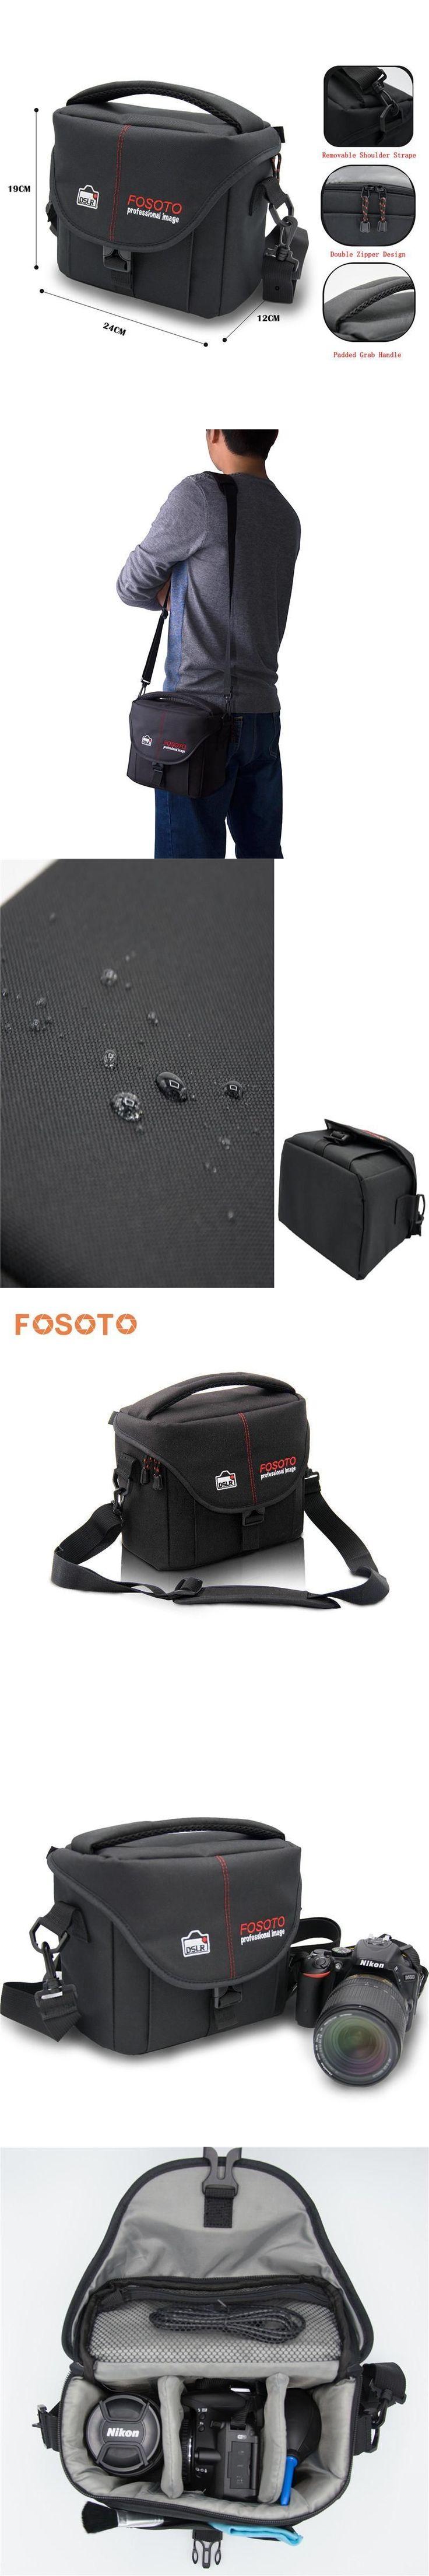 fosoto DSLR Camera Bag Case Cover Video Photo Digital photography Shoulder Nylon Bags For Dslr Sony Canon Nikon D700 D300 D200